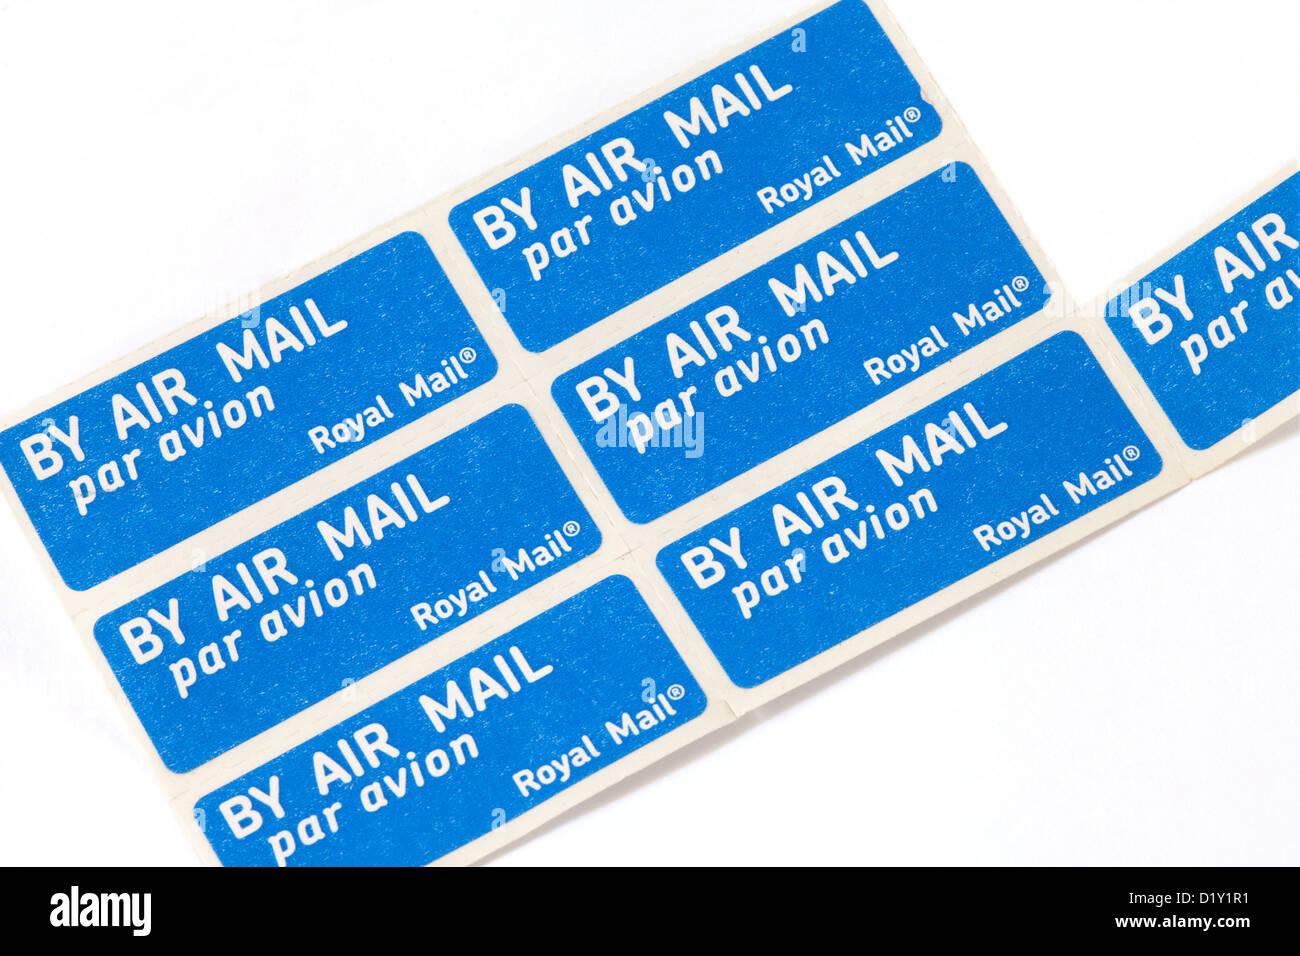 Air mail par avion letter stamp stamps sticker stickers, UK Stock ...